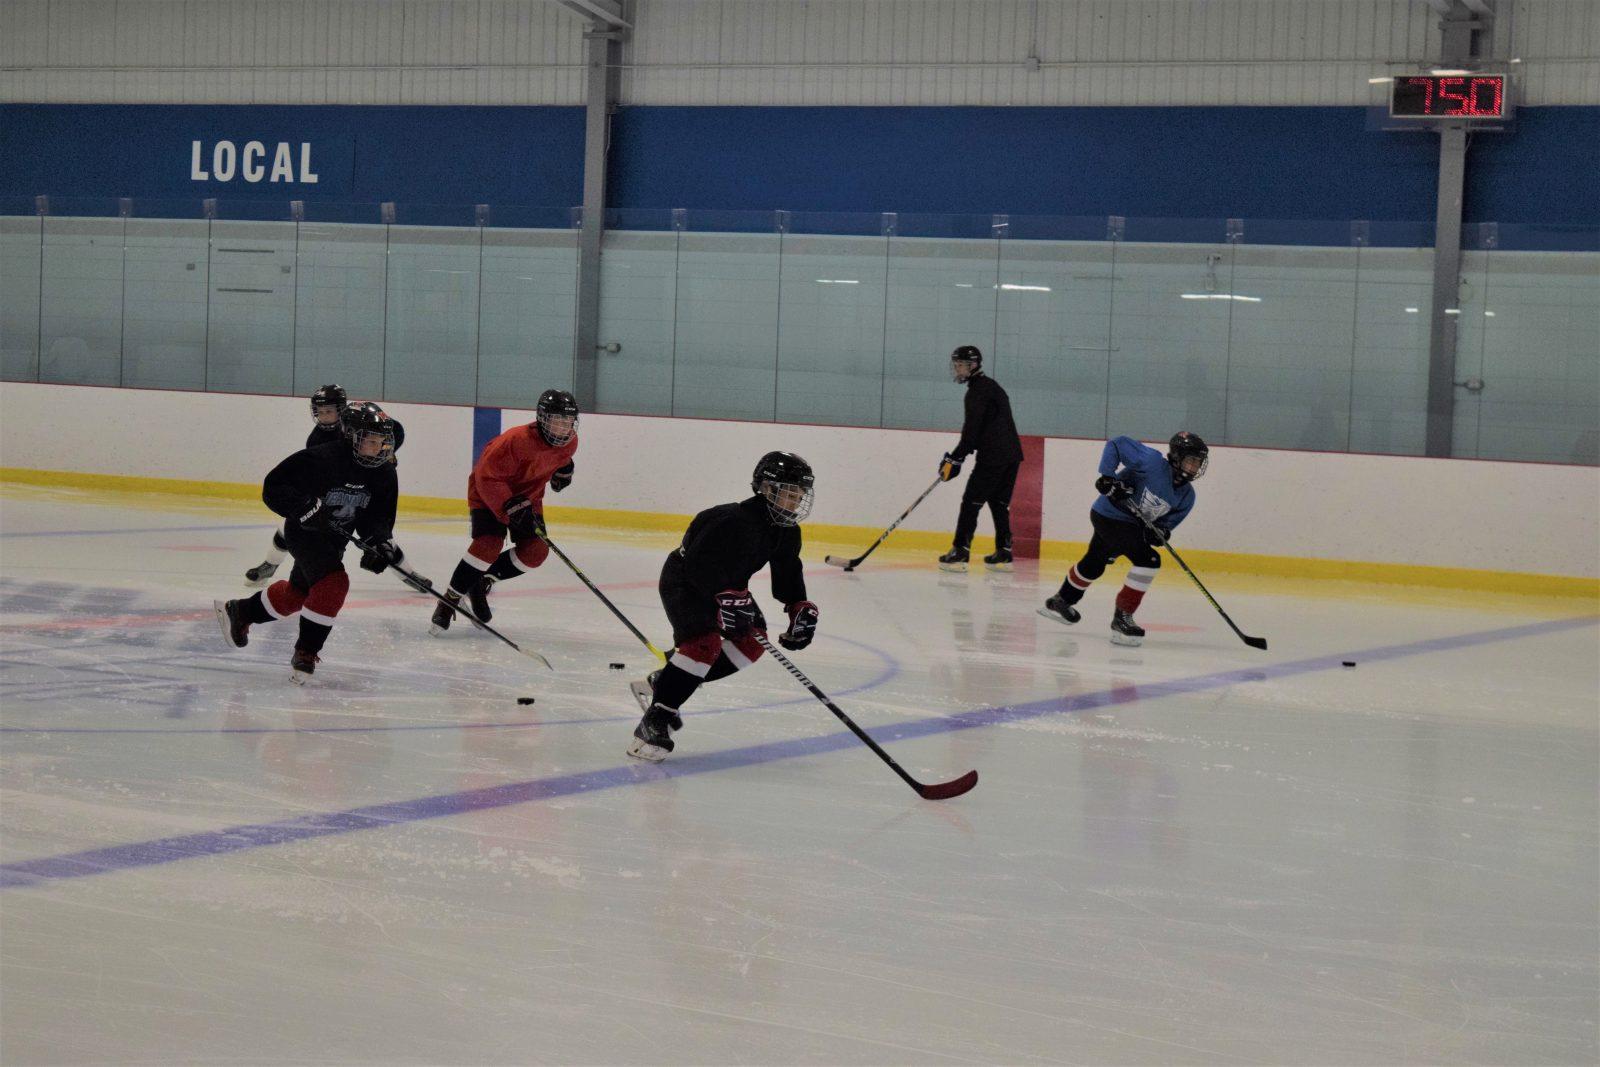 Hockey mineur : Un retour progressif à 5 contre 5